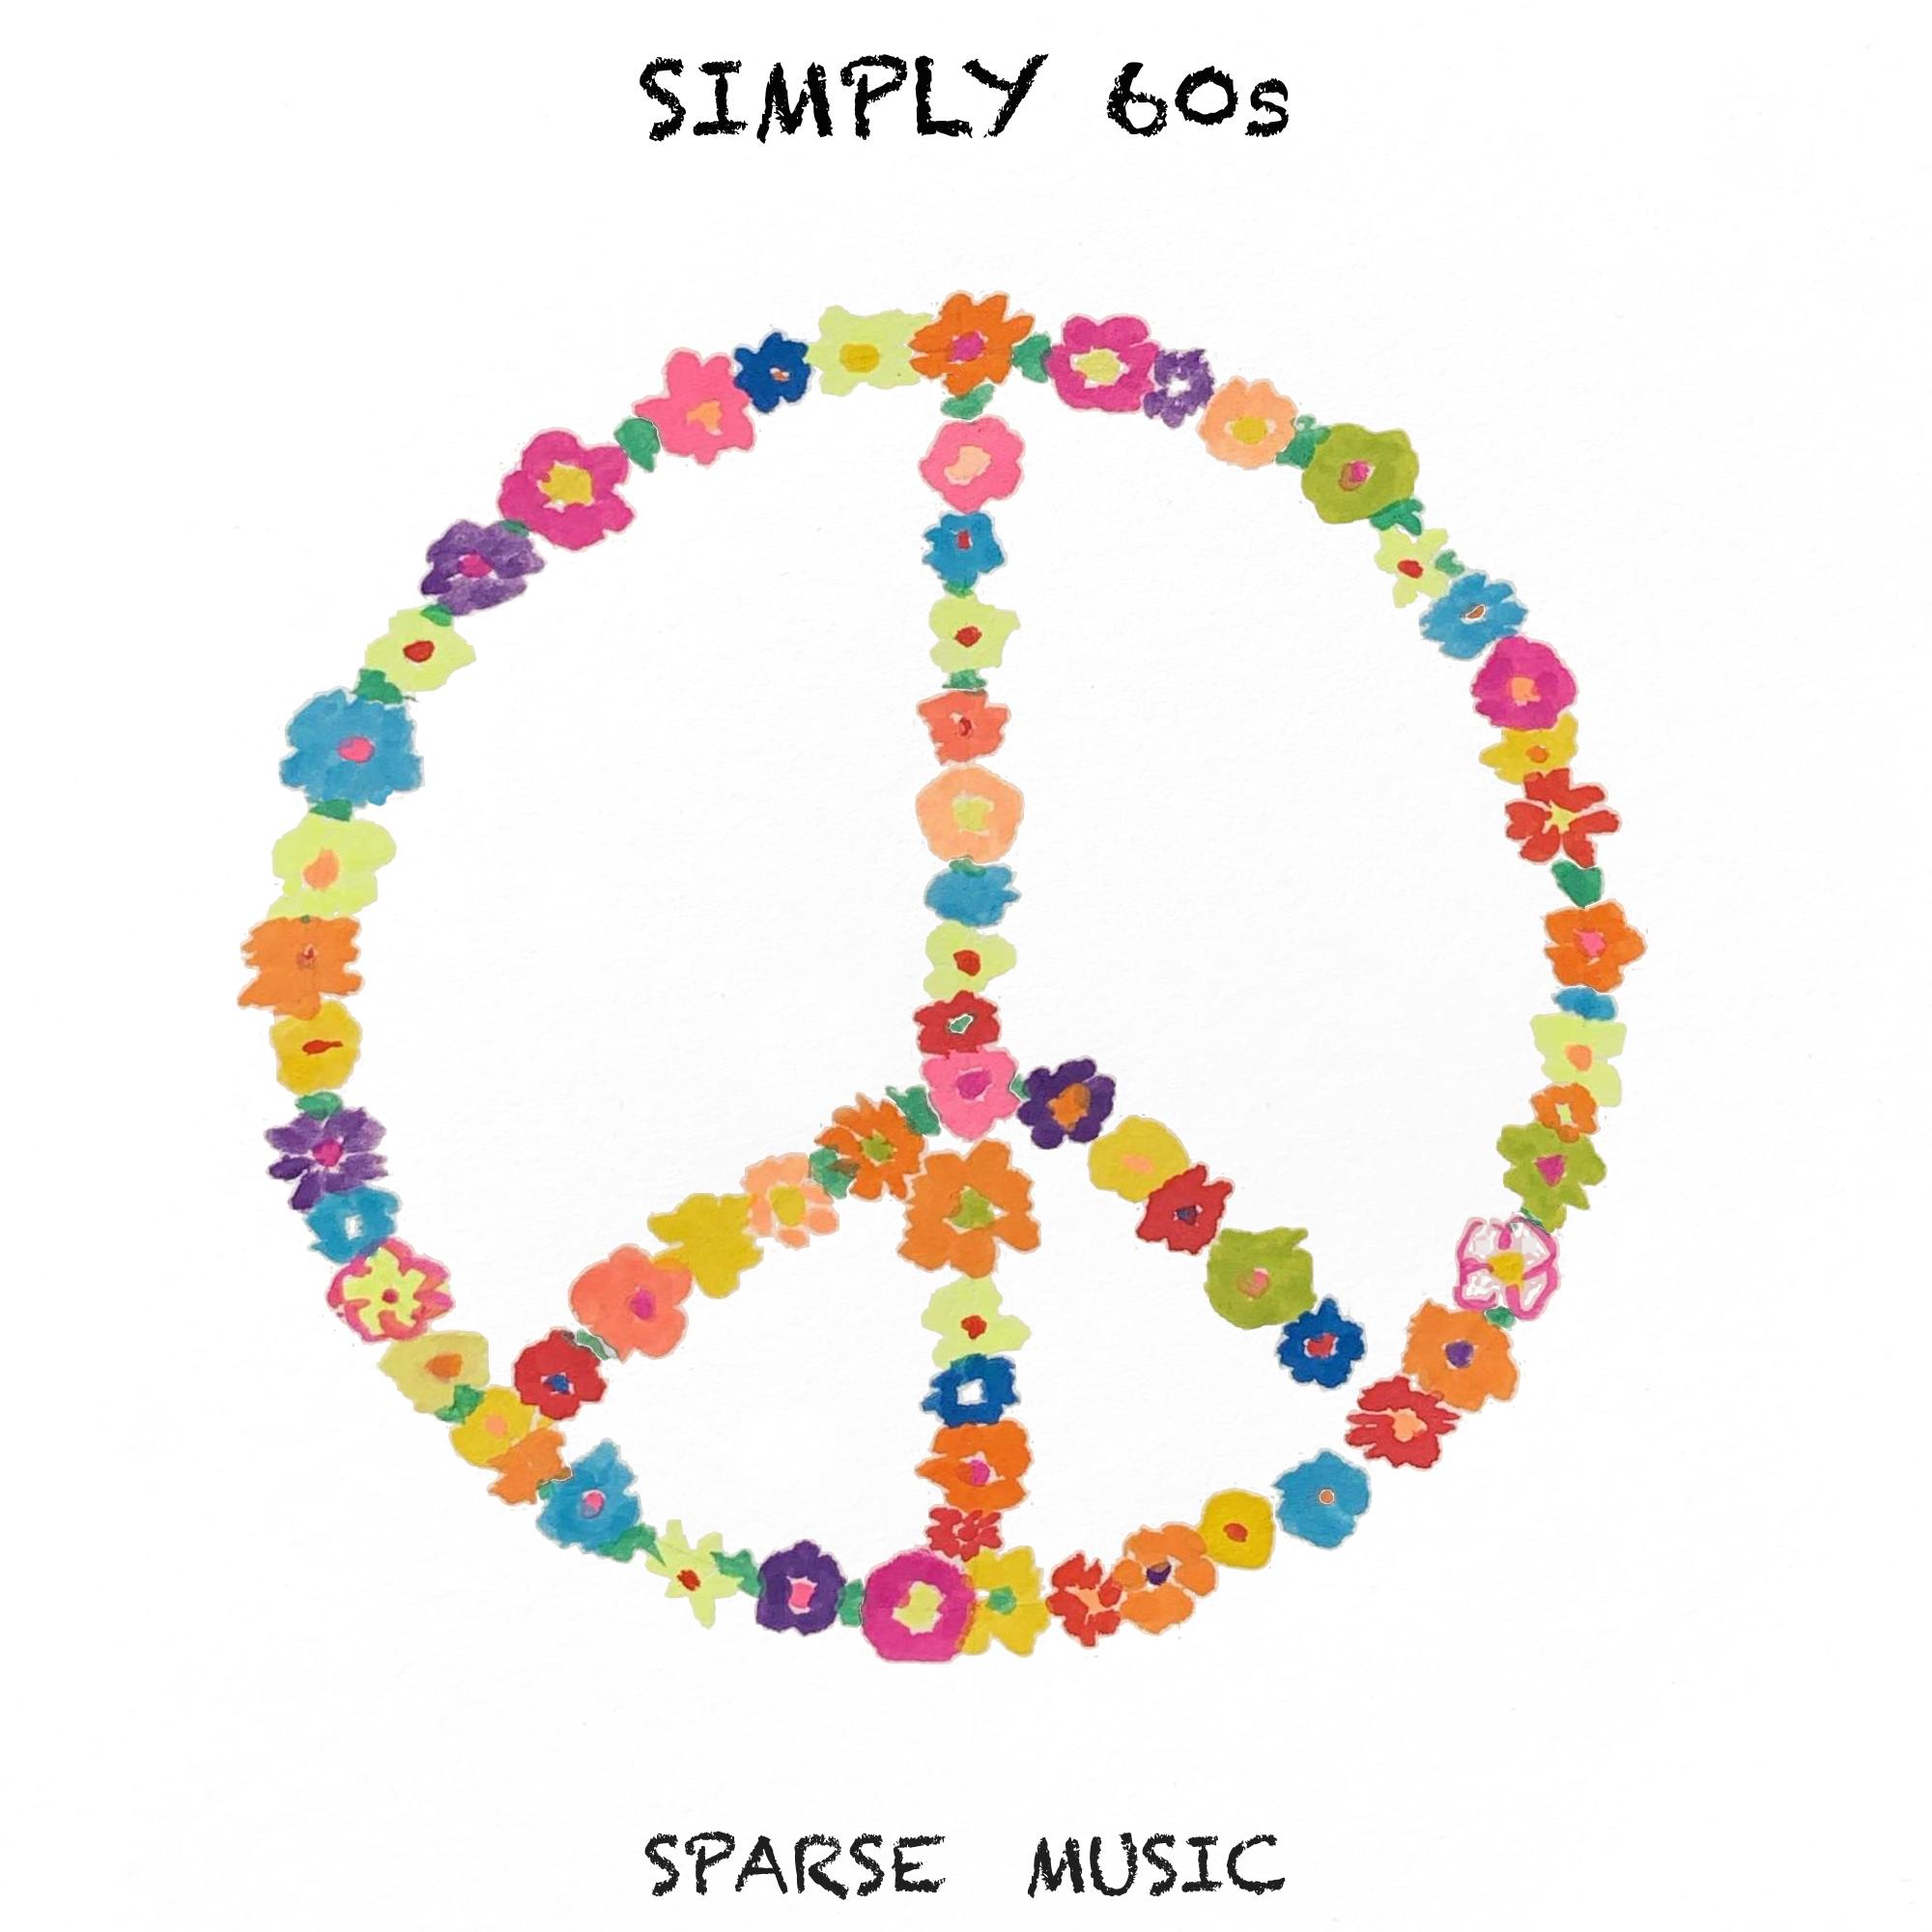 SPRS 01081 SIMPLY 60s 2000